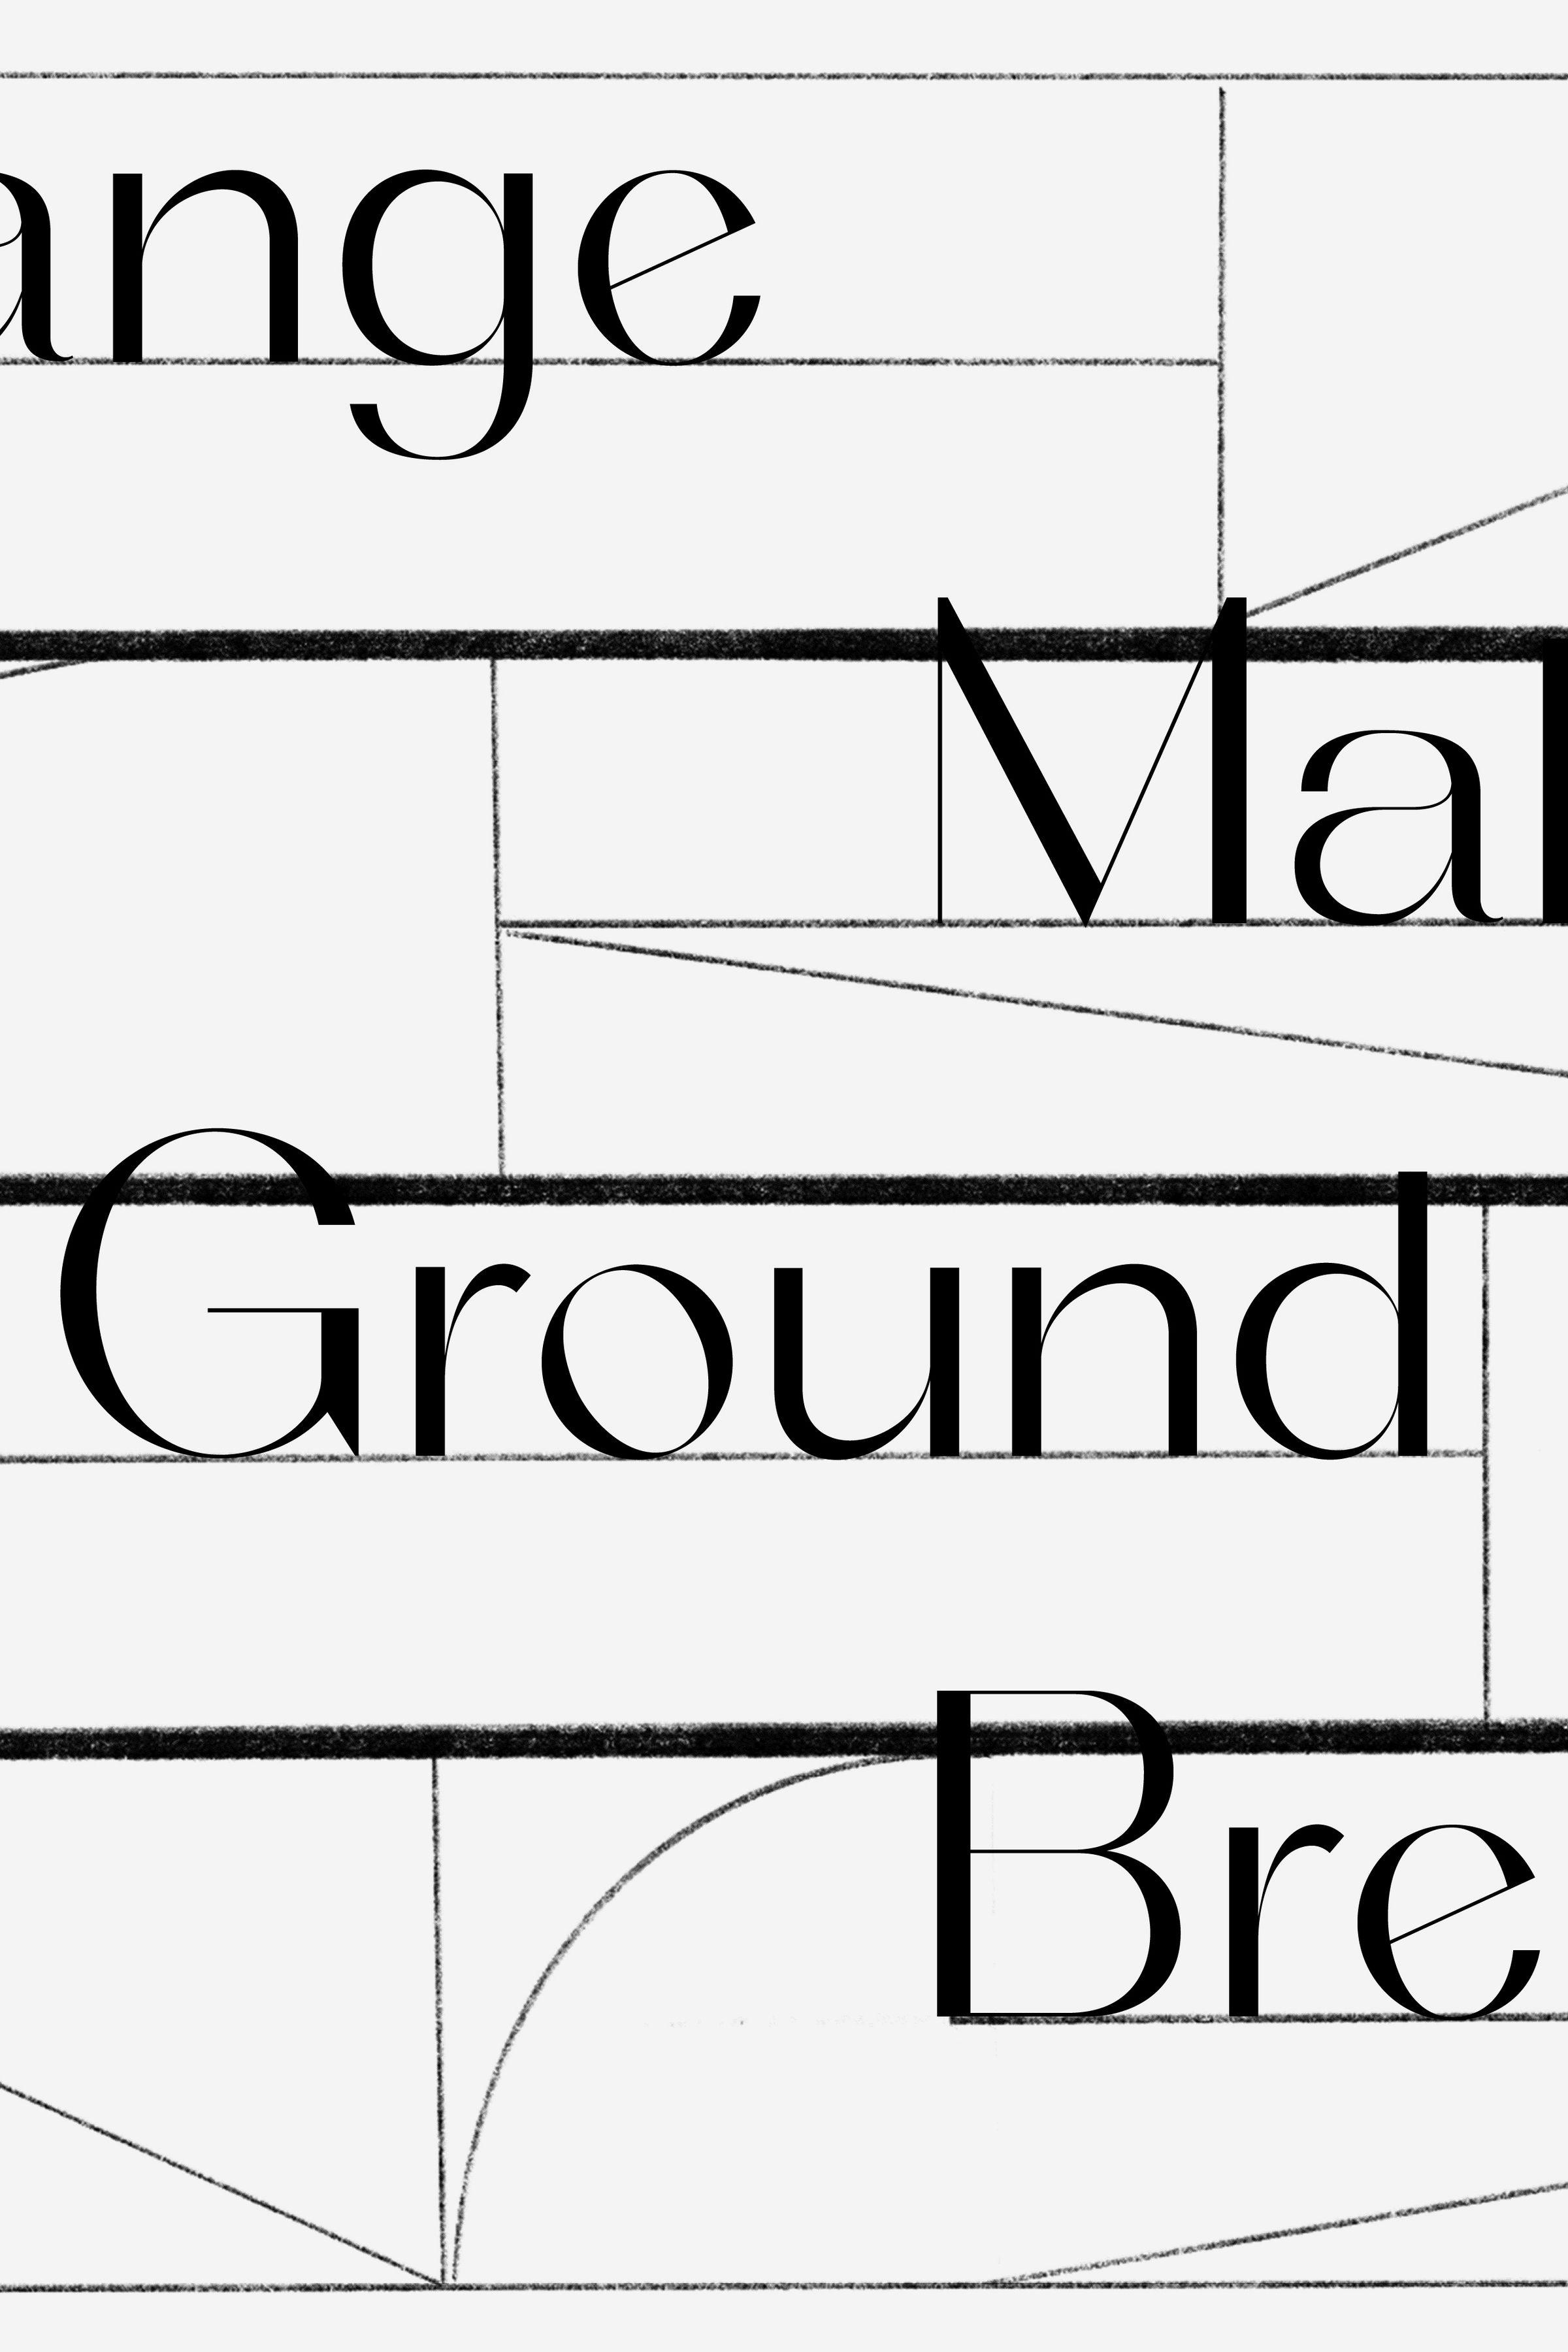 Rika Magazine issue no. 20 custom typography design